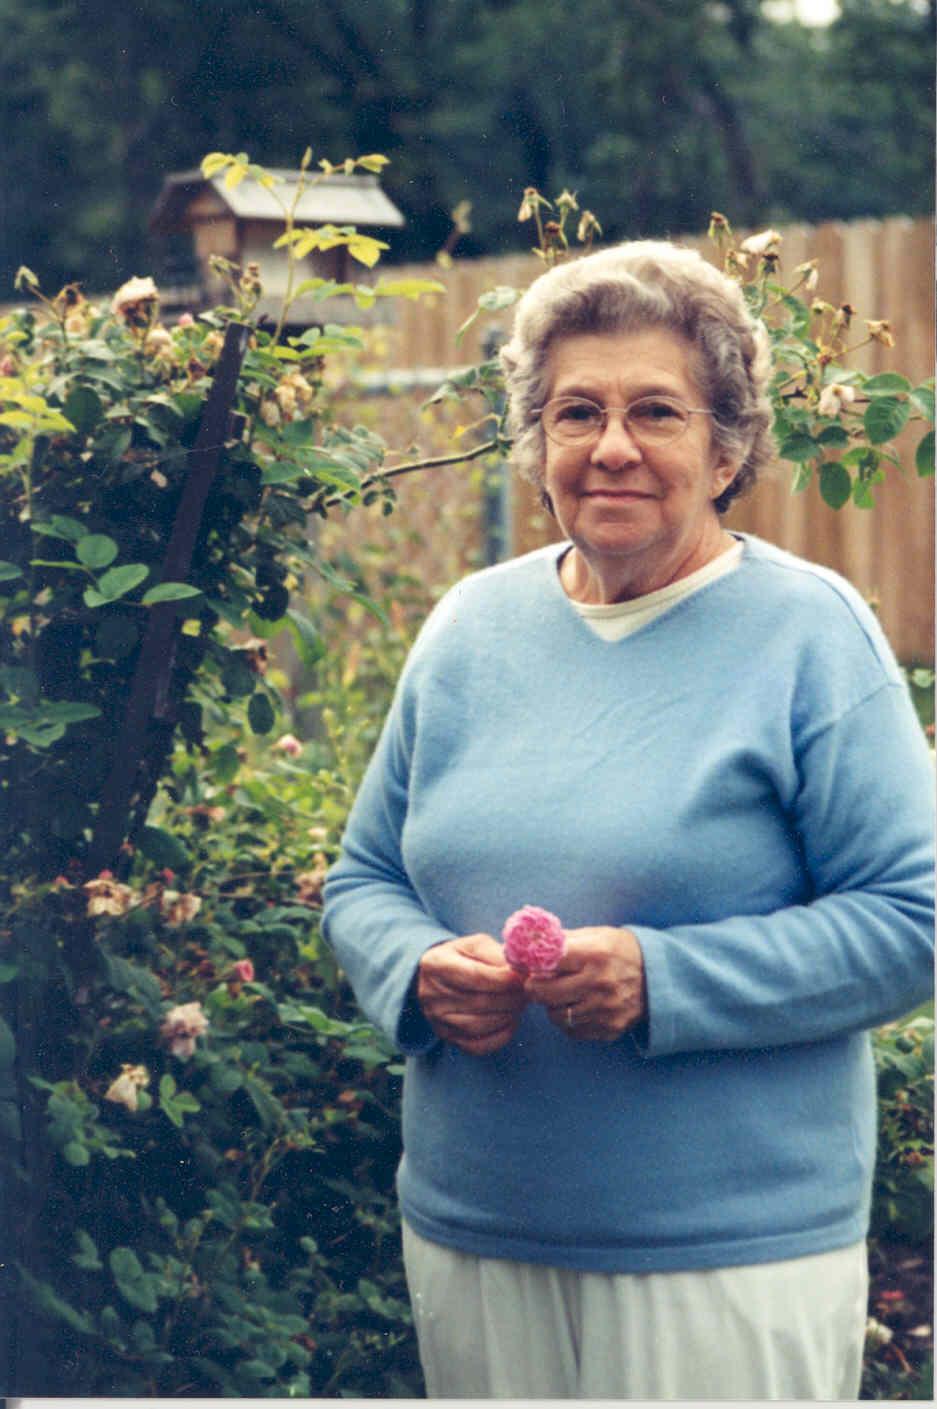 My grandma in the garden.